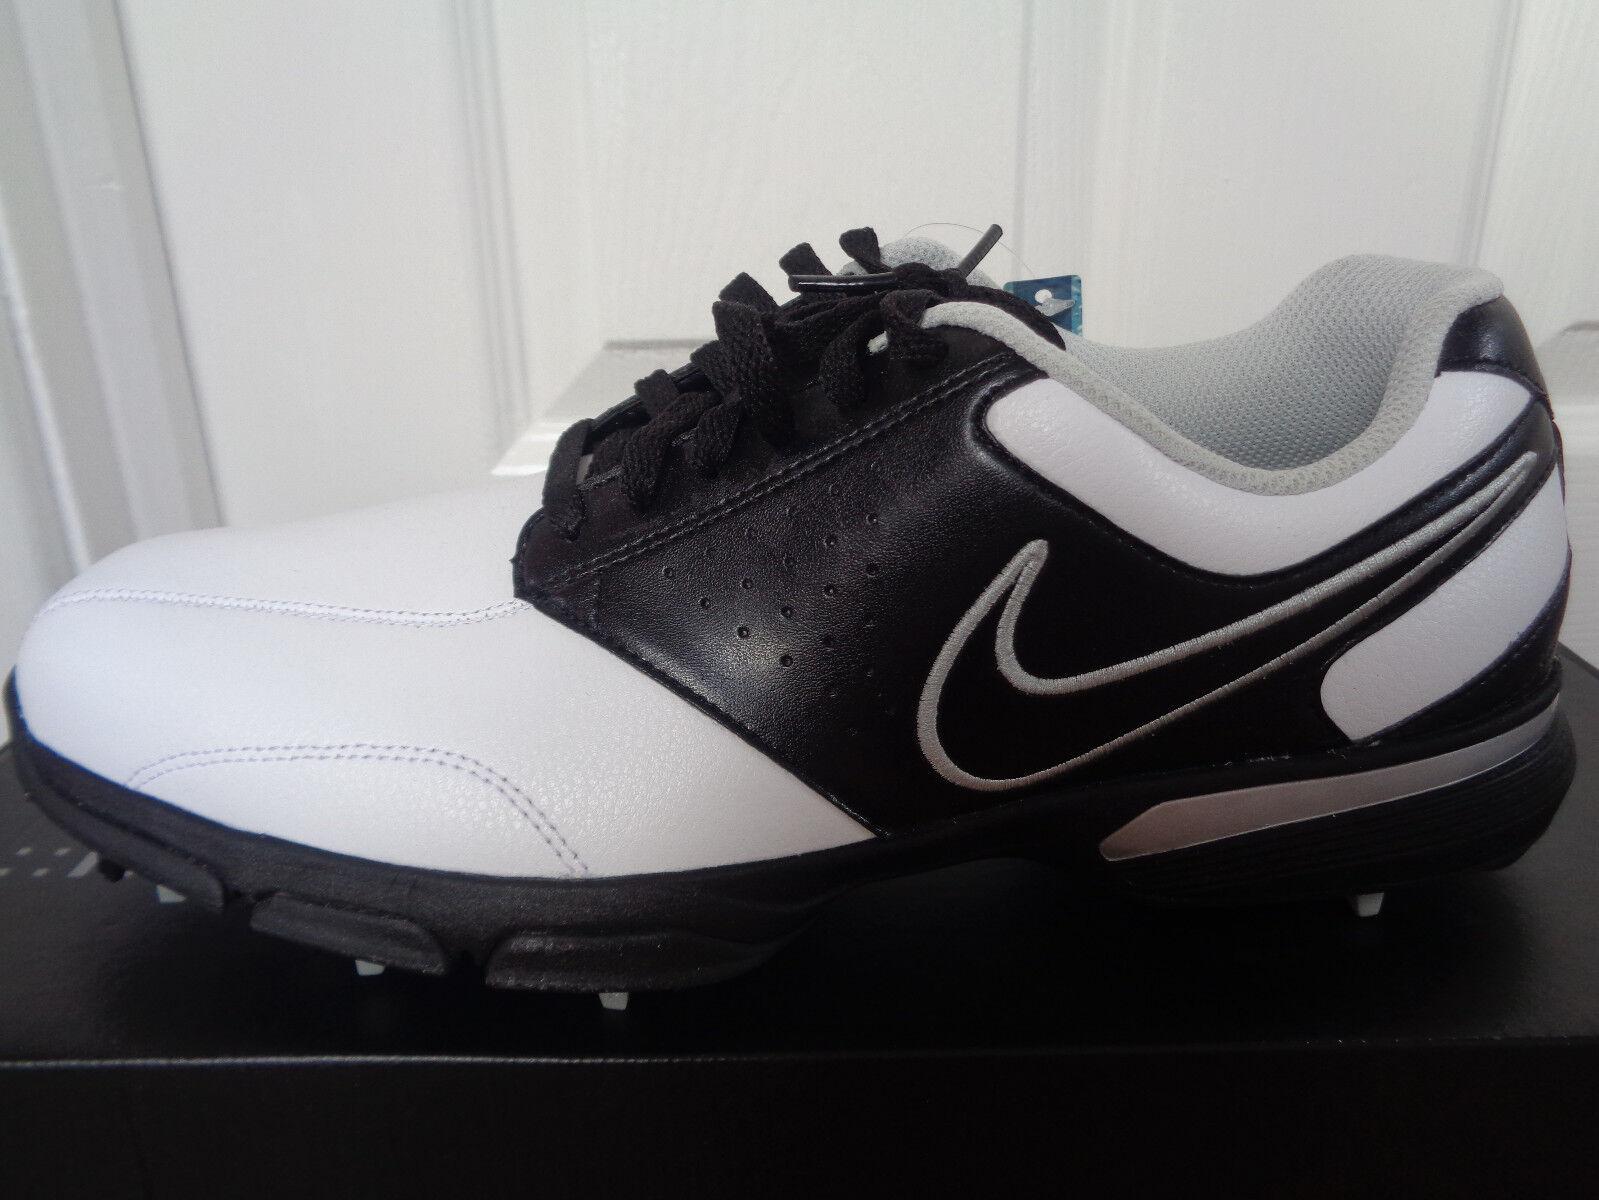 Nike homme Vintage Saddle II EU homme Nike golf chaussures 552080 100 7.5 eu 42 us 8.5 NEWBOX ea3618